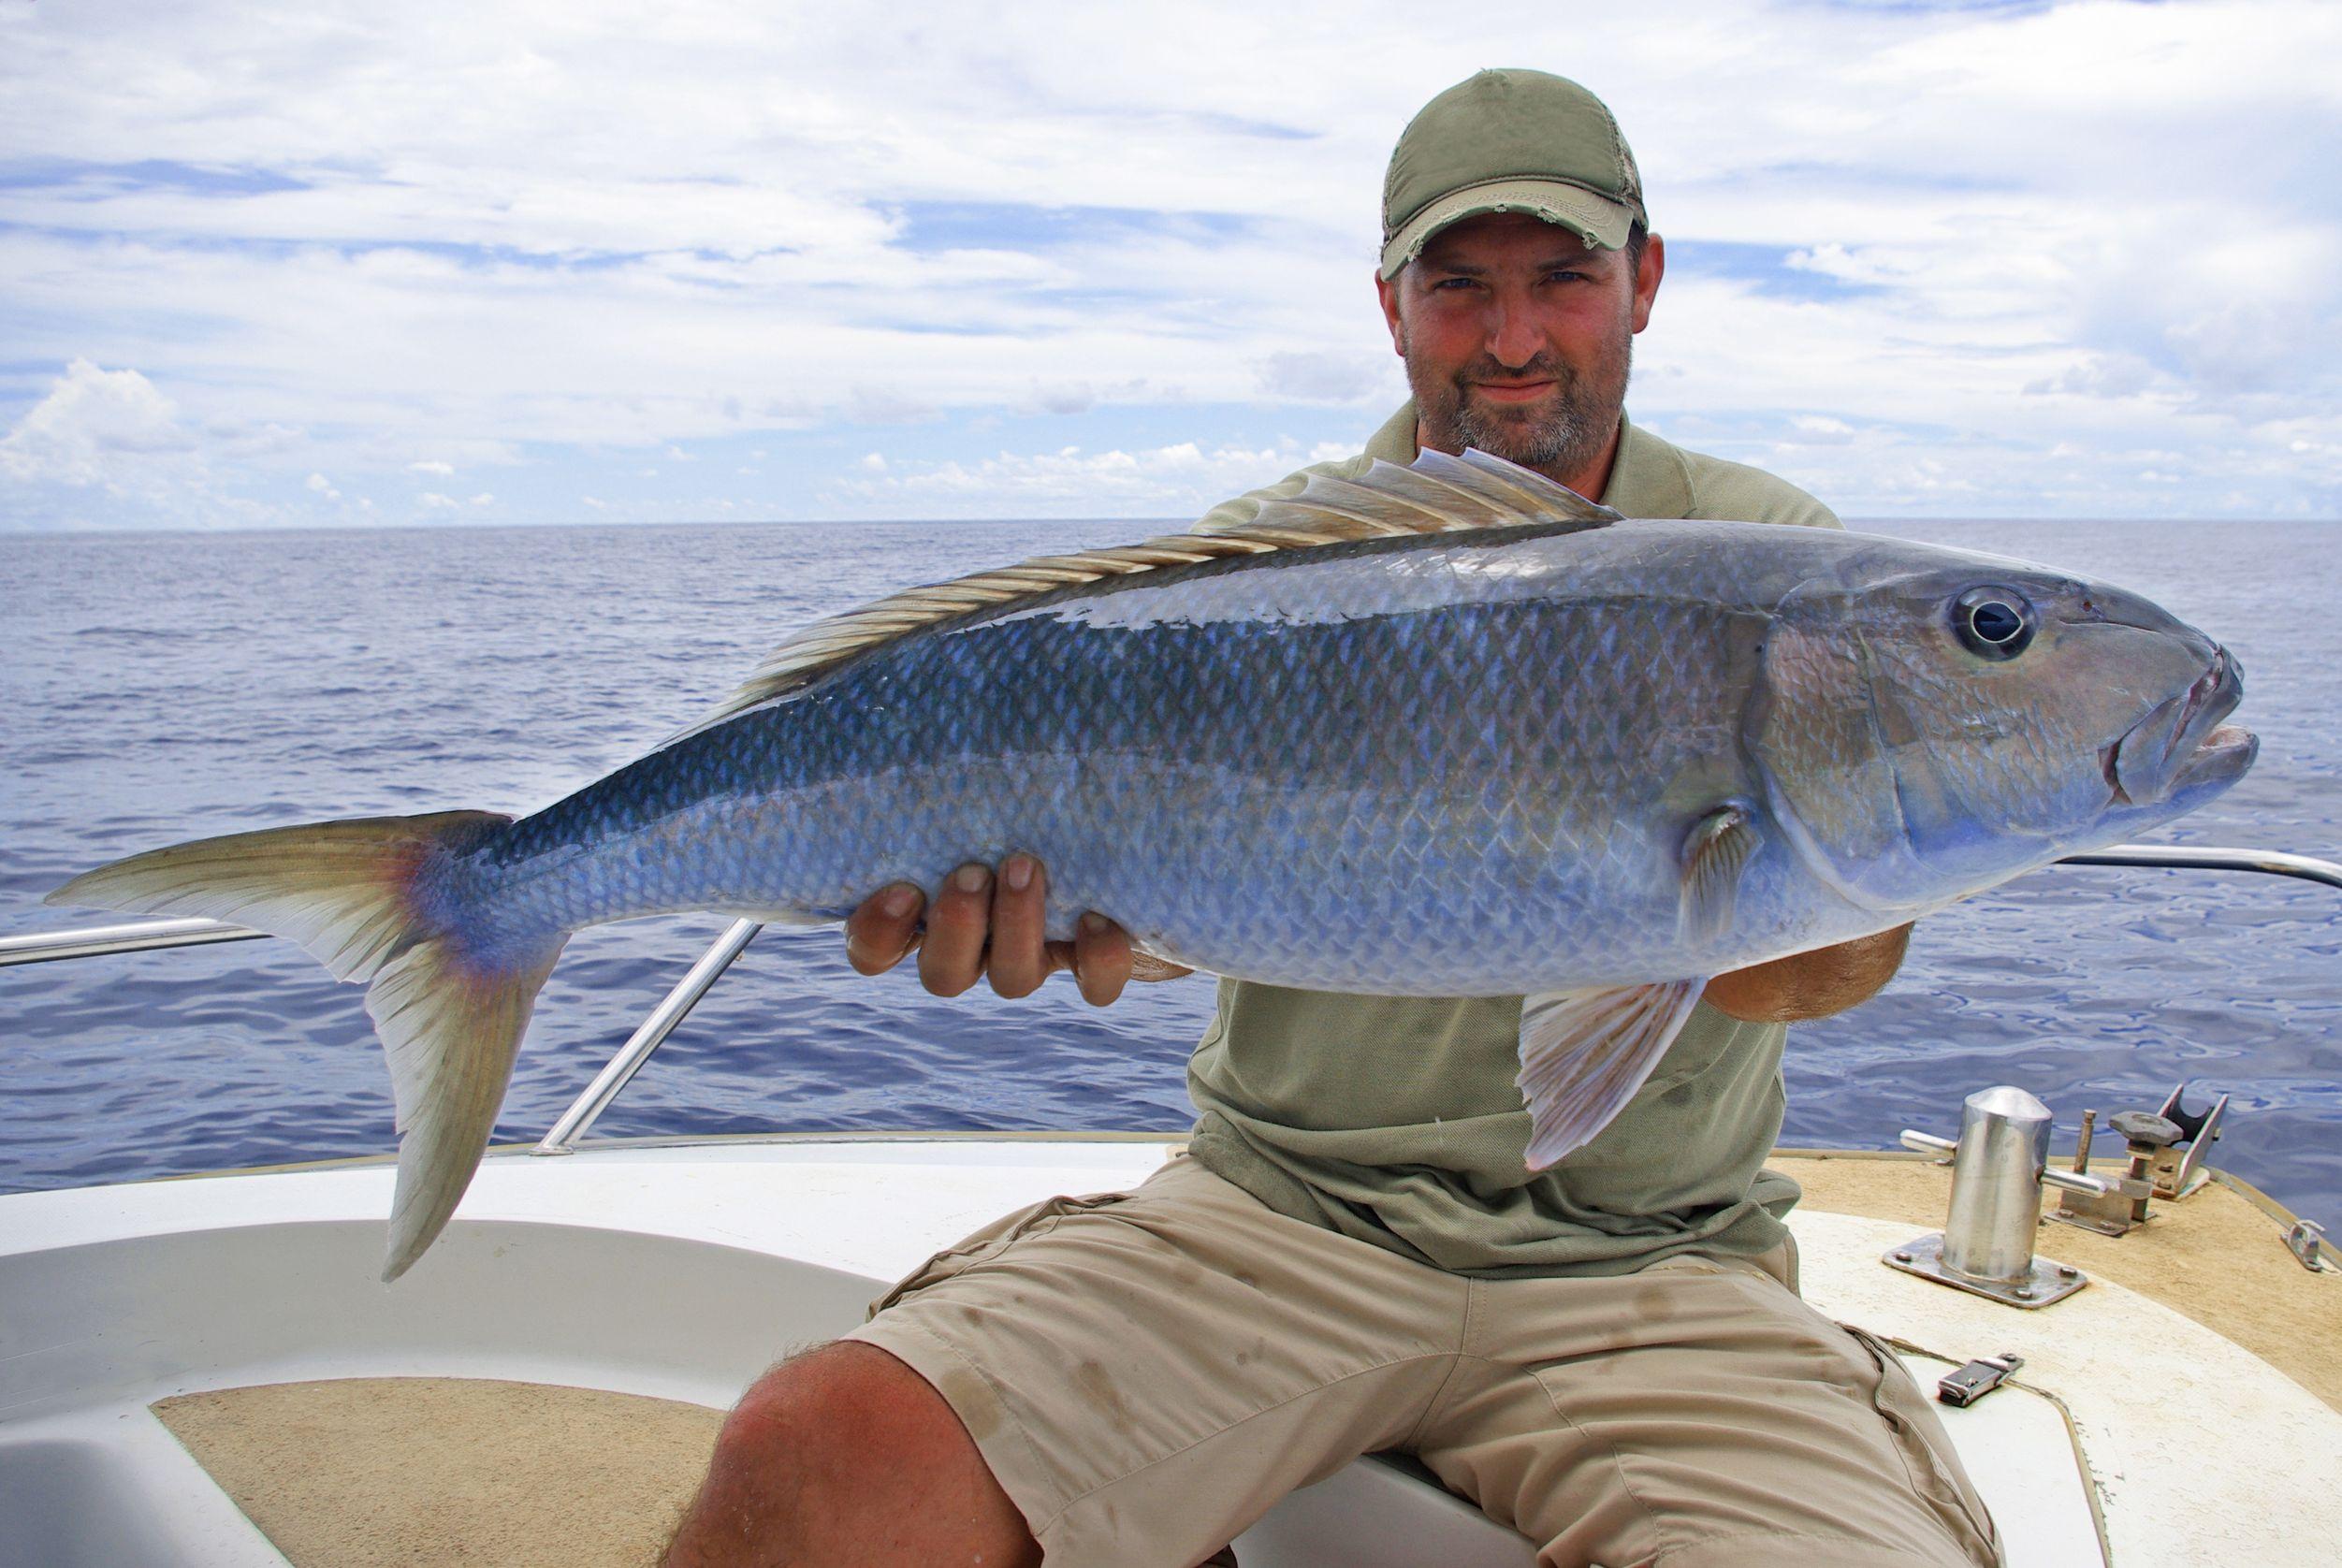 grandpa fishing 123rf